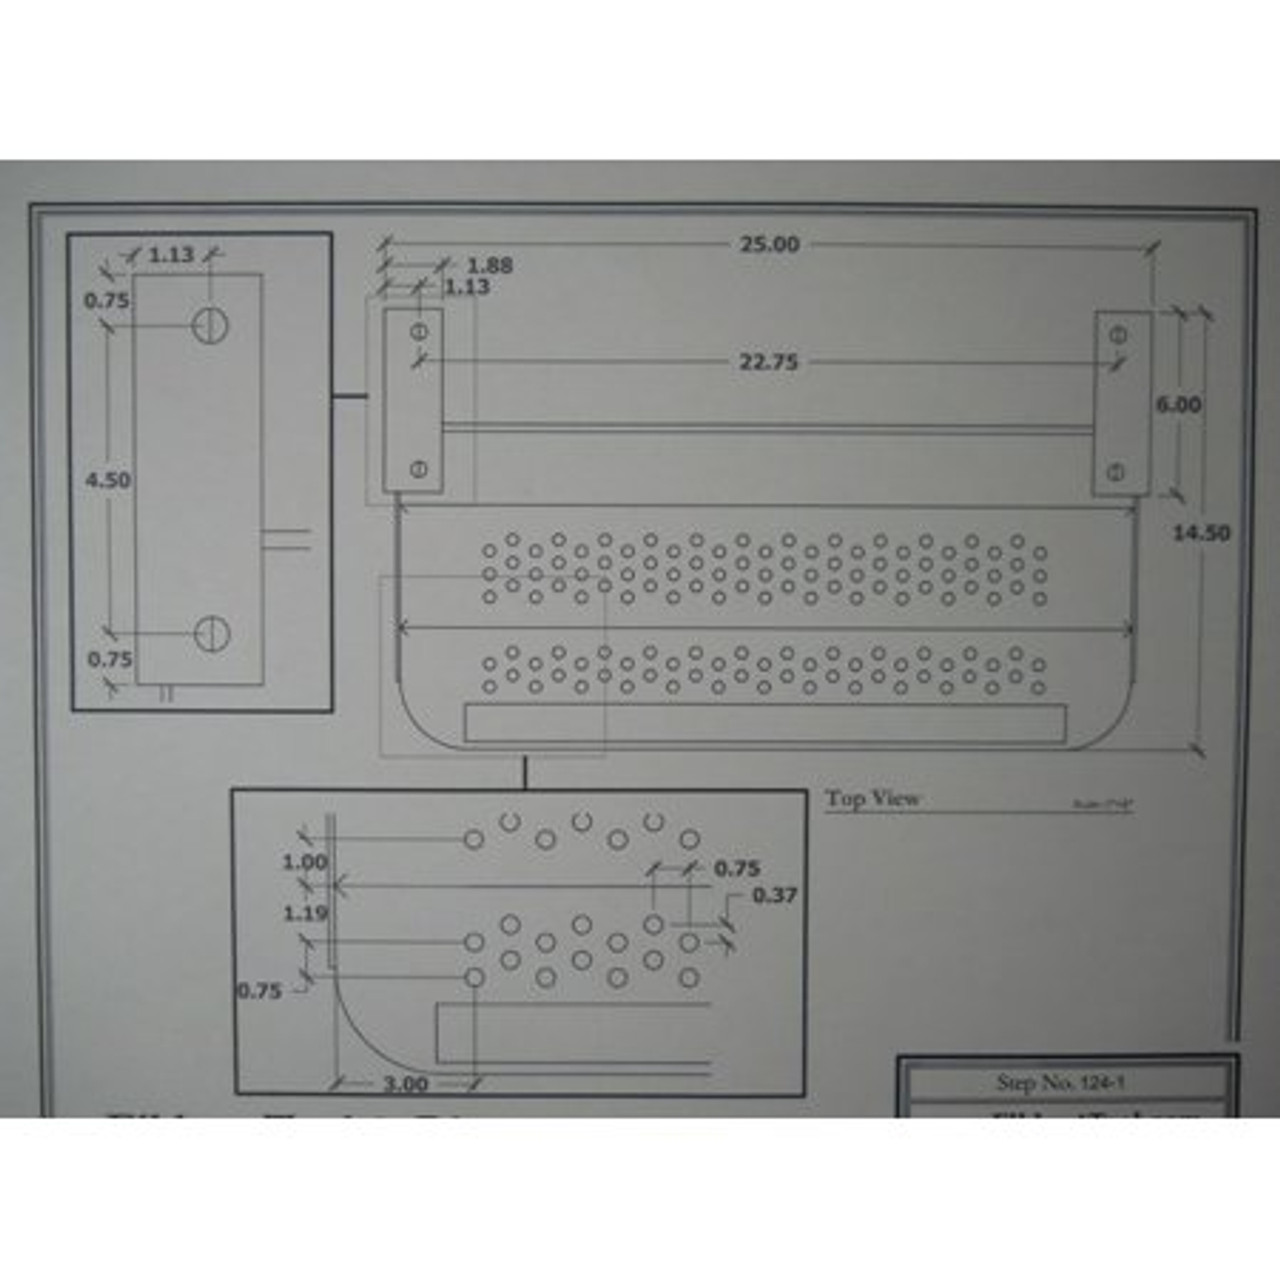 "24"" SINGLE TRAILER STEP - 5"" DROP - (04-1002) DIMENSIONS"